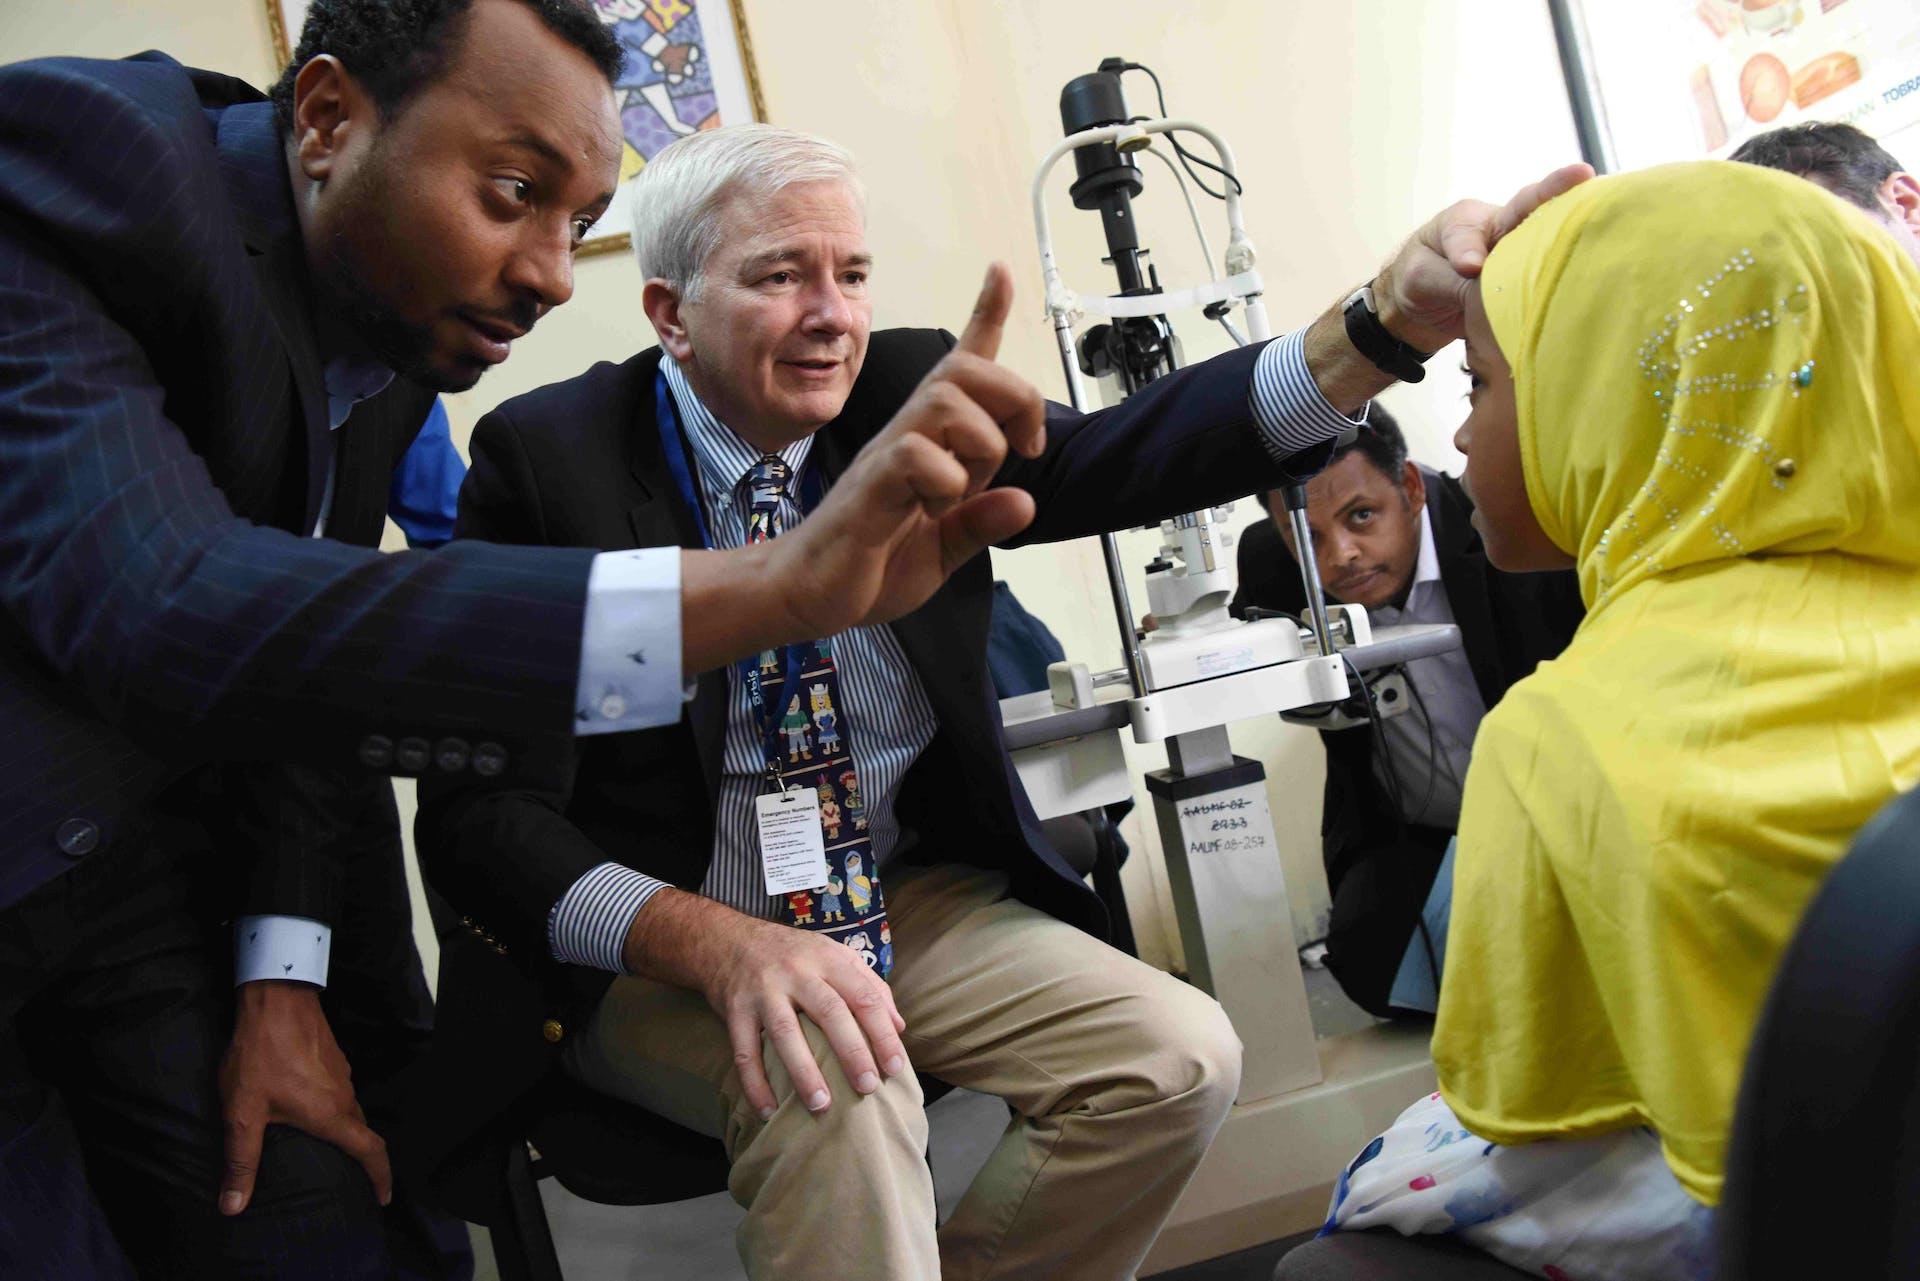 Dr. Douglas Fredrick pediatric strabismus specialist examining a patient at Menelik II Referral Hospital, Addis Ababa, Ethiopia